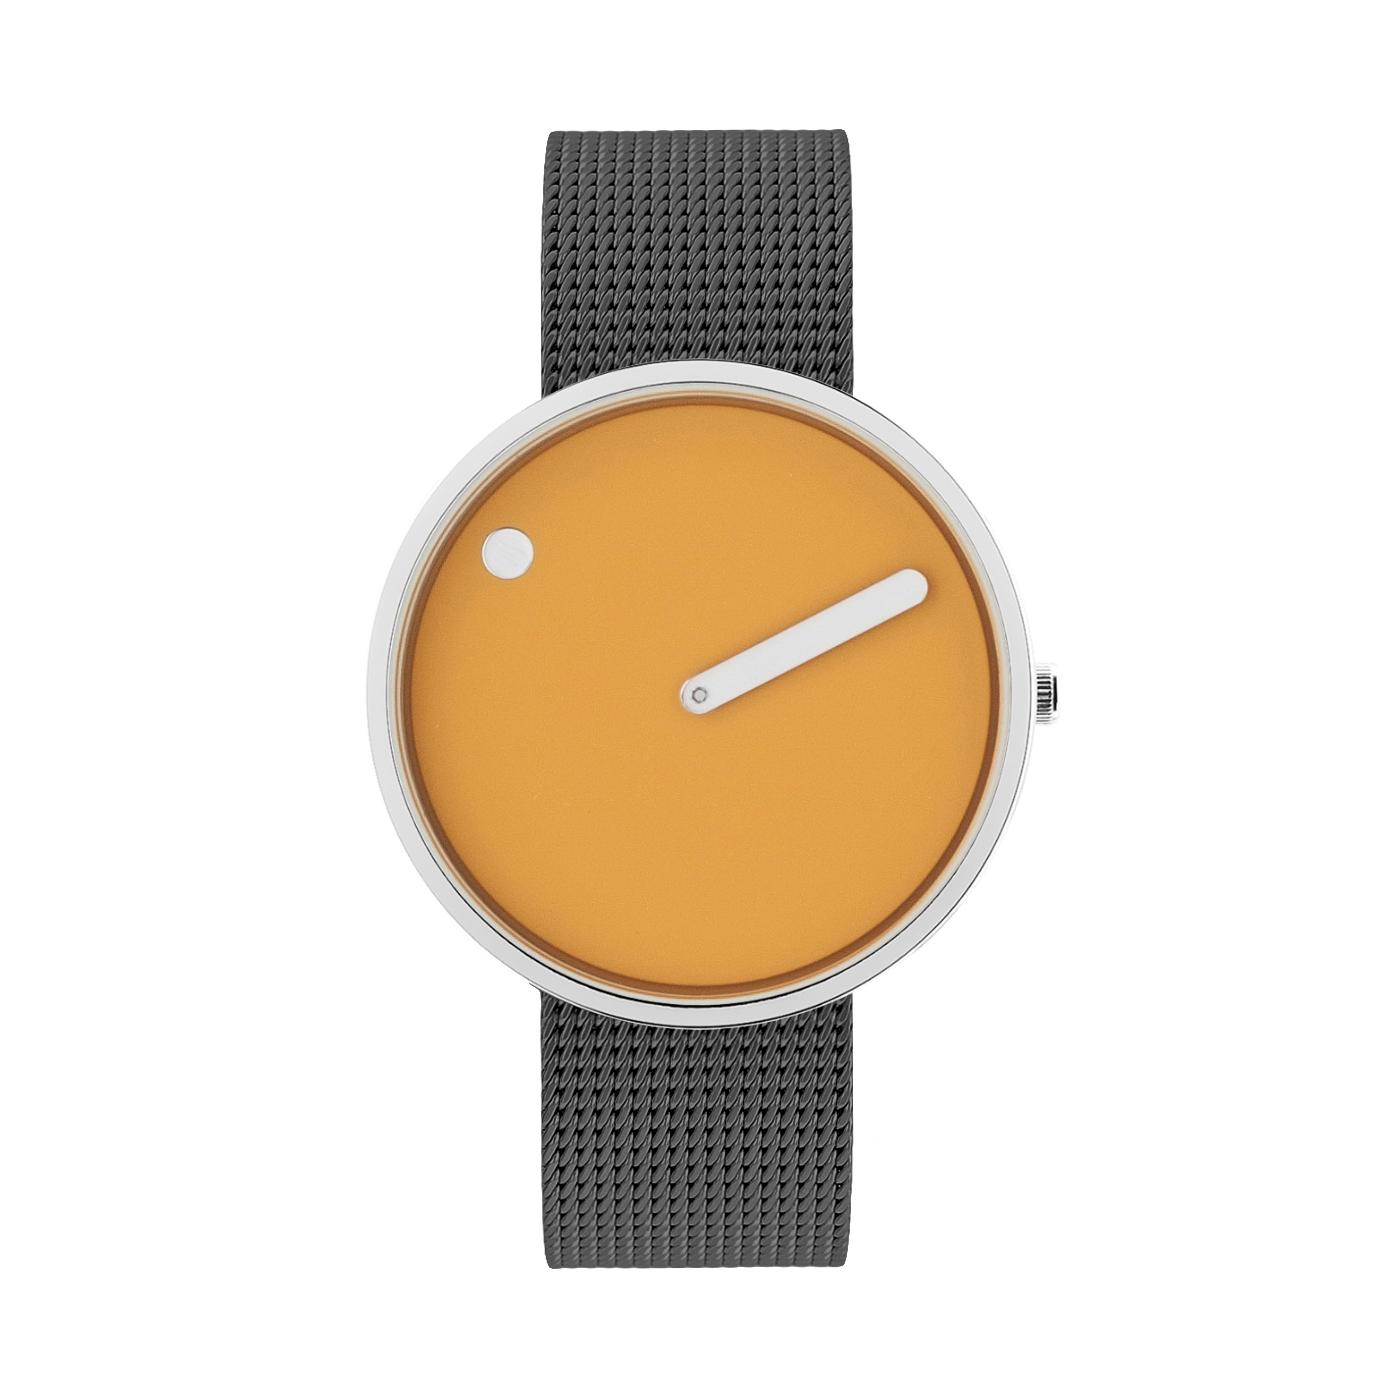 PICTO armbåndsur Ø40 i gul med grå meshlænke